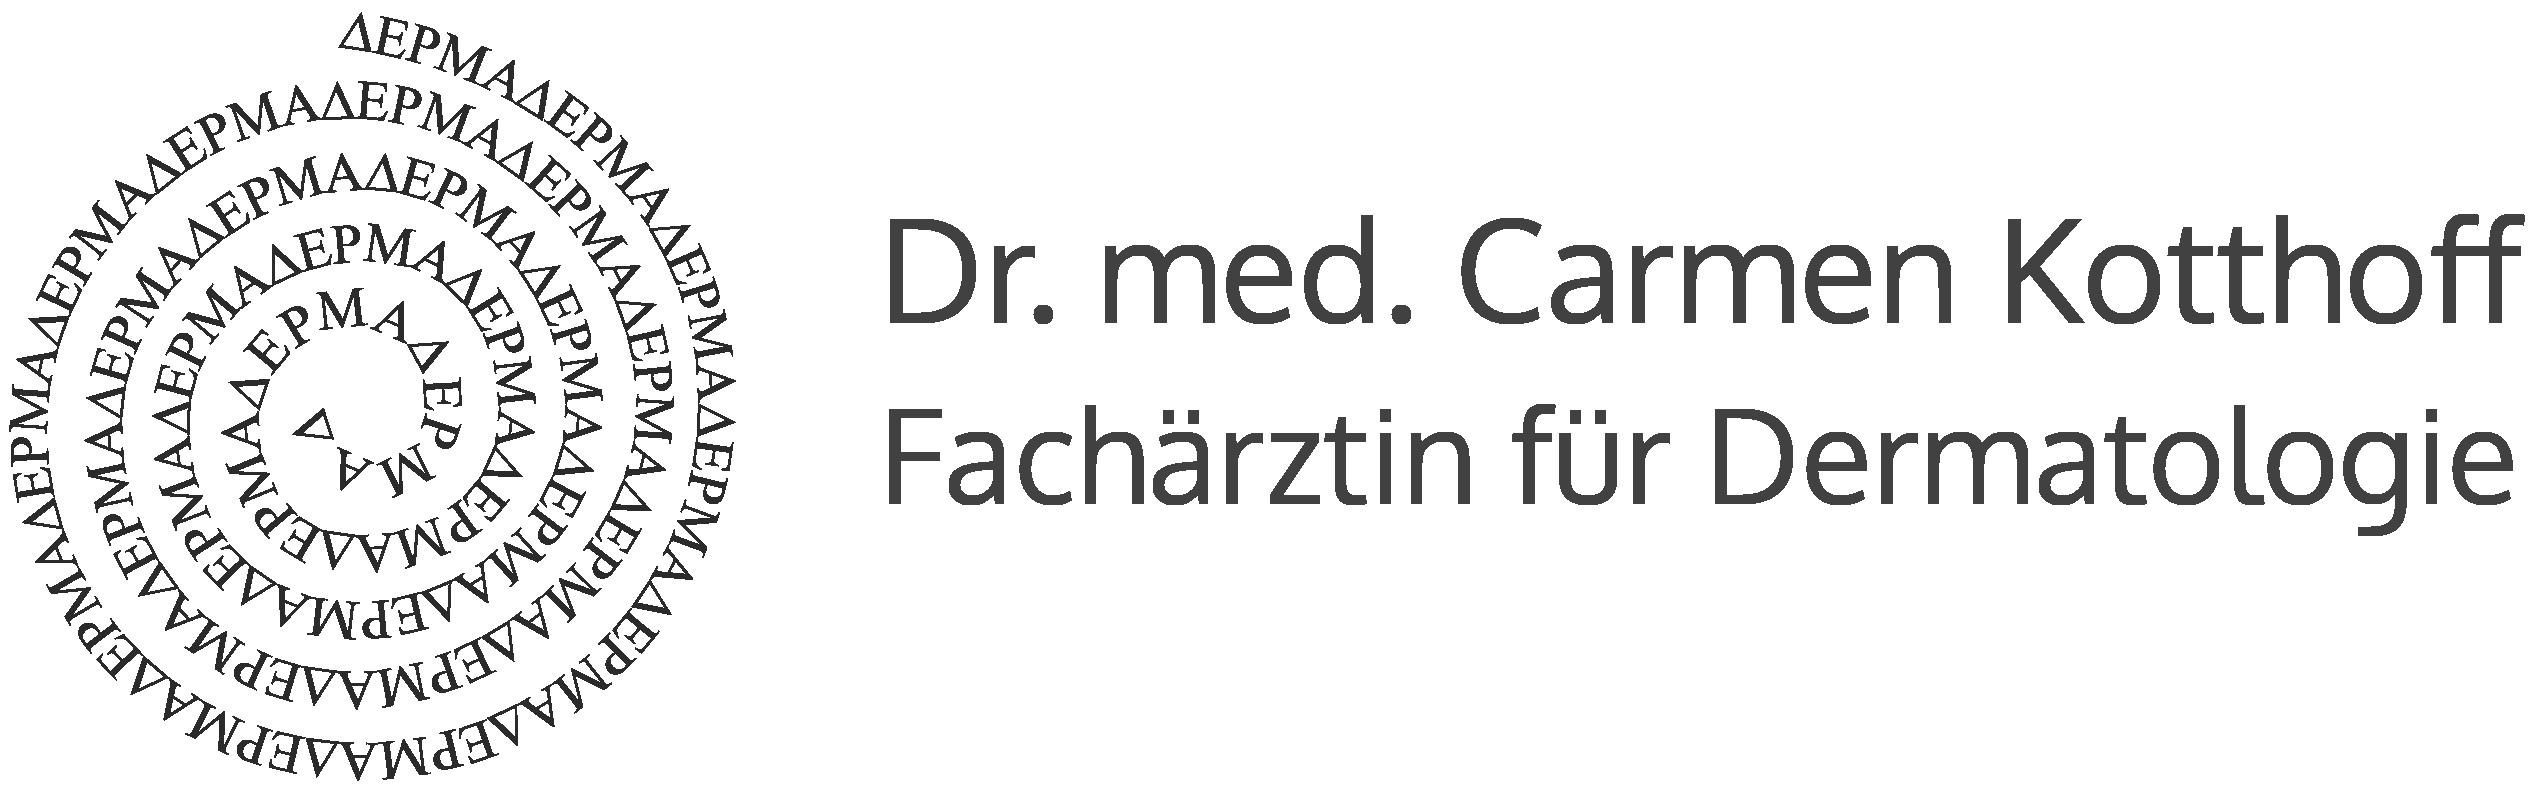 Hautarztpraxis Dr. med Carmen Kotthoff